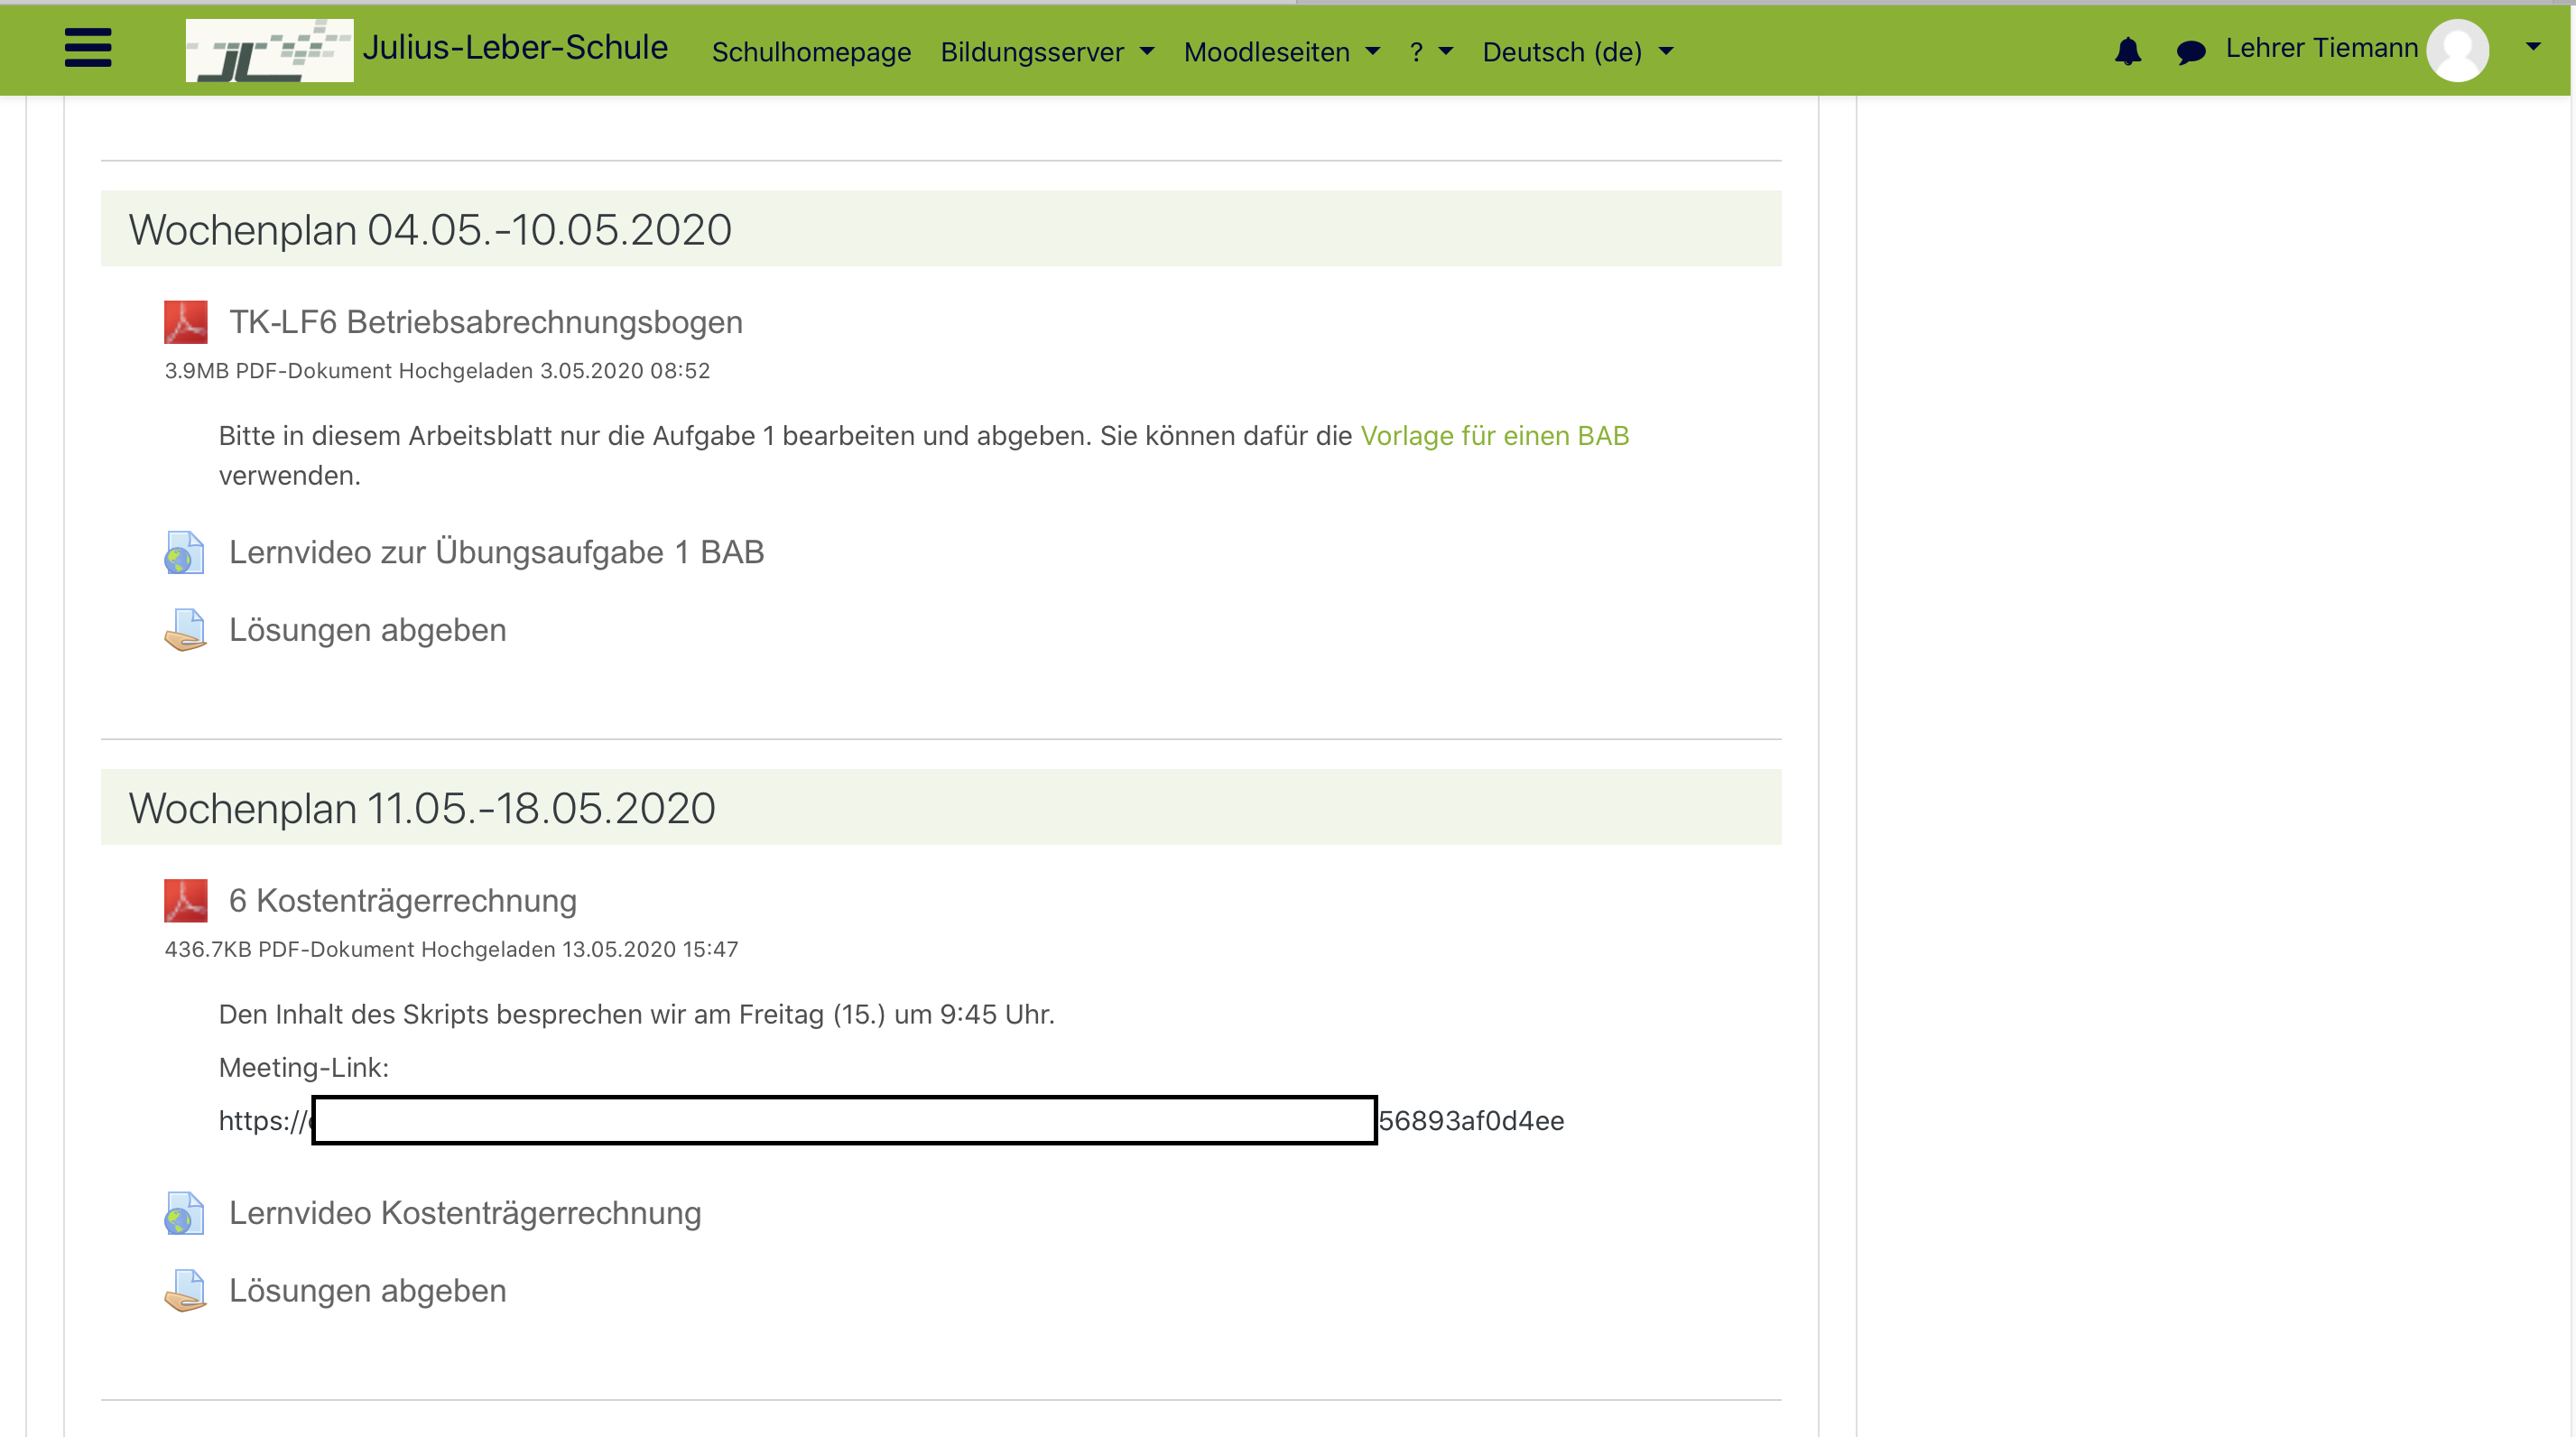 Moodle-Screenshot_Tiemann